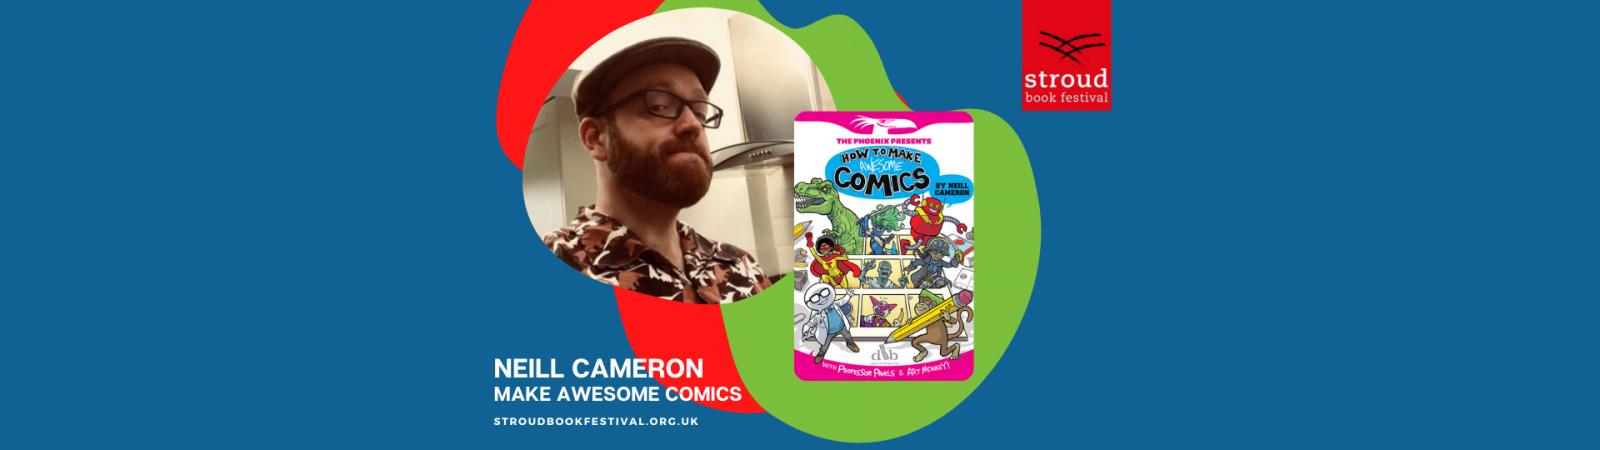 Neill Cameron, Make Awesome Comics